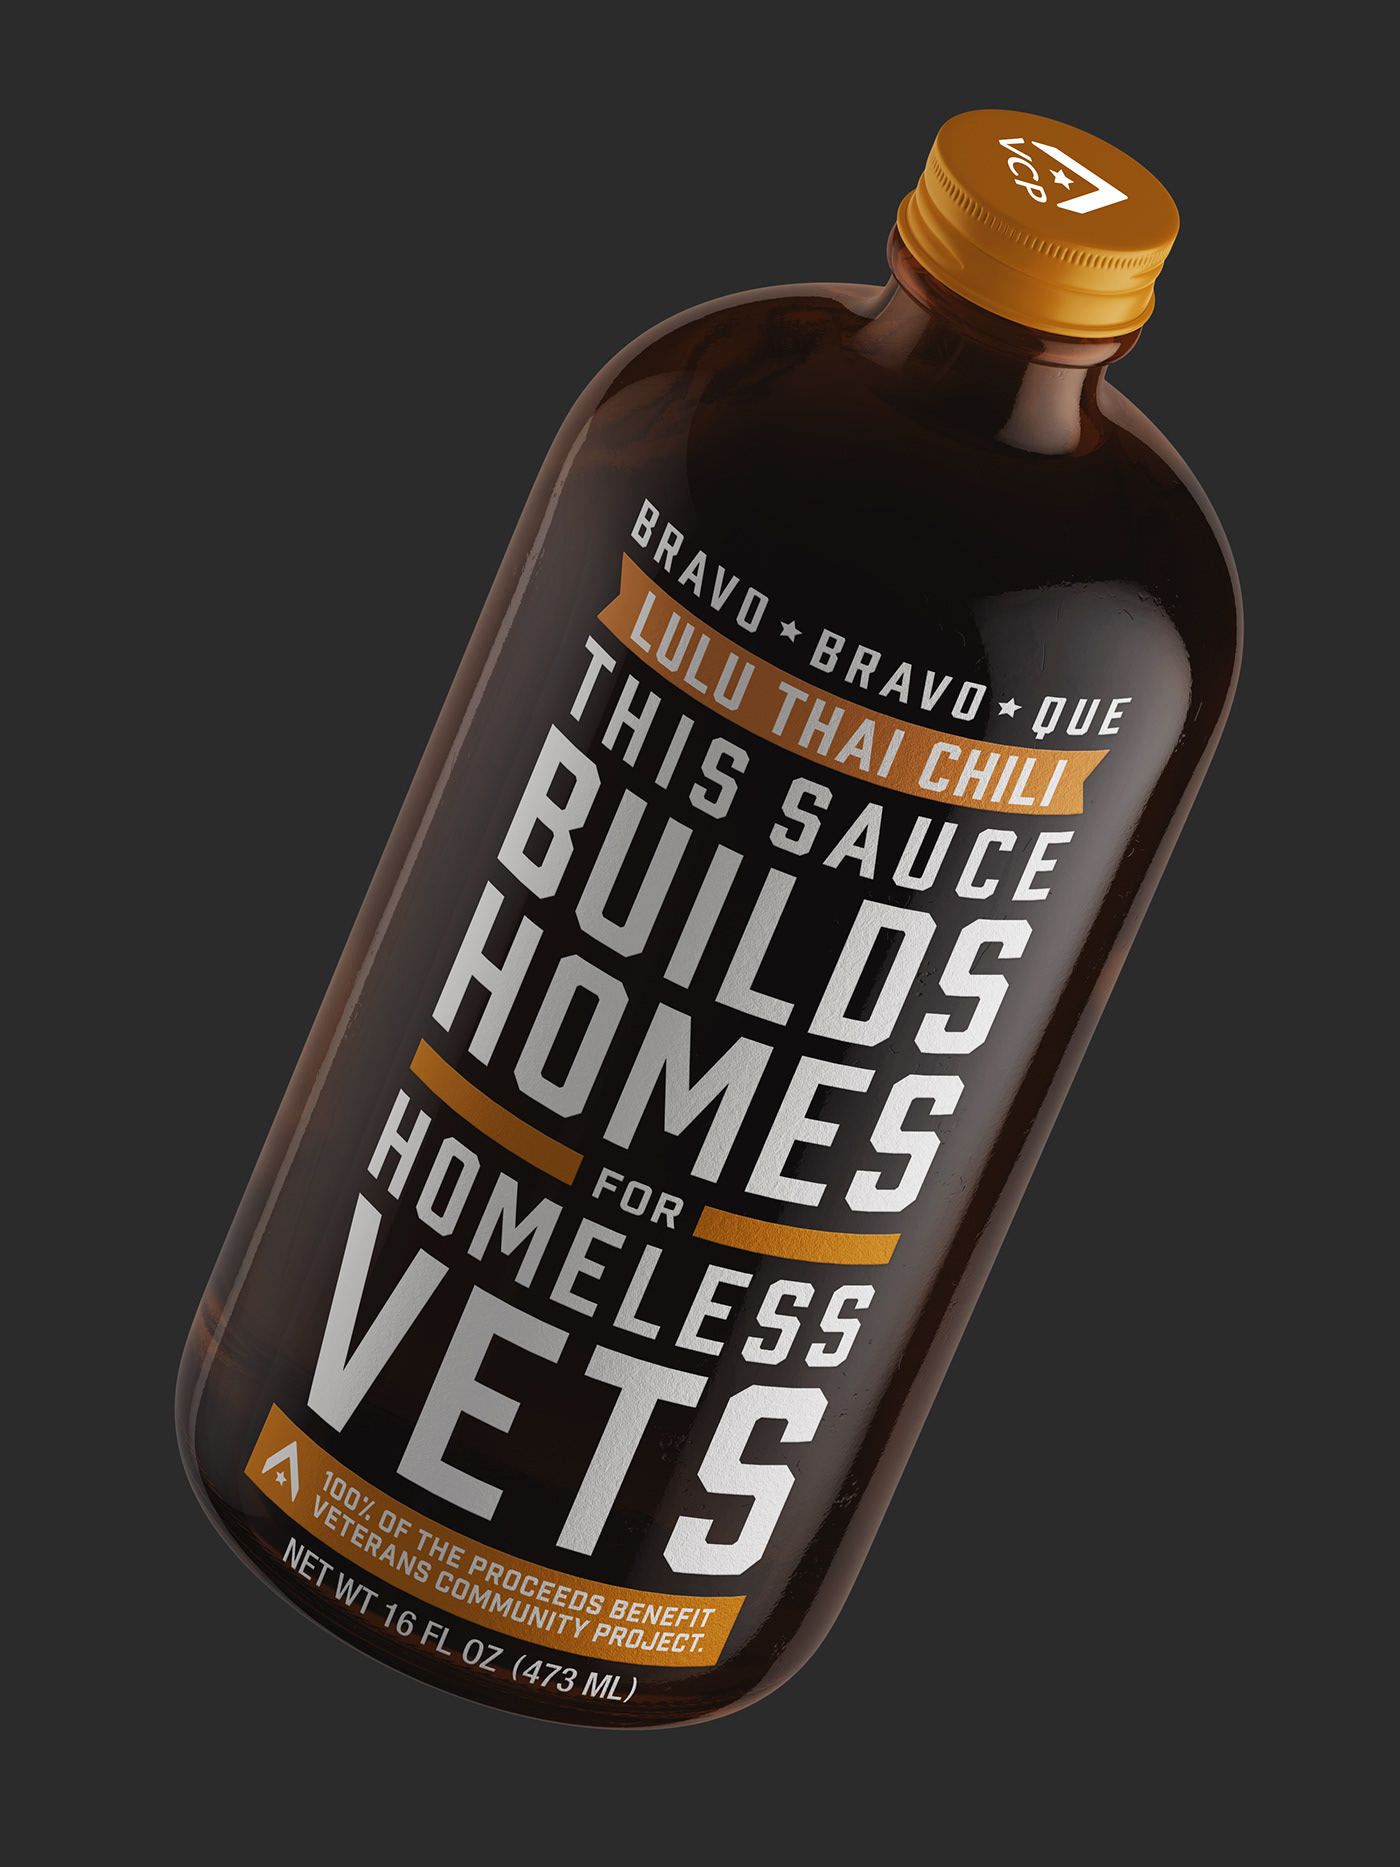 barbecue sauce BBQ bbq sauce BBQ Sauce Bottle branding  Packaging VCP VeteransCommunityProject